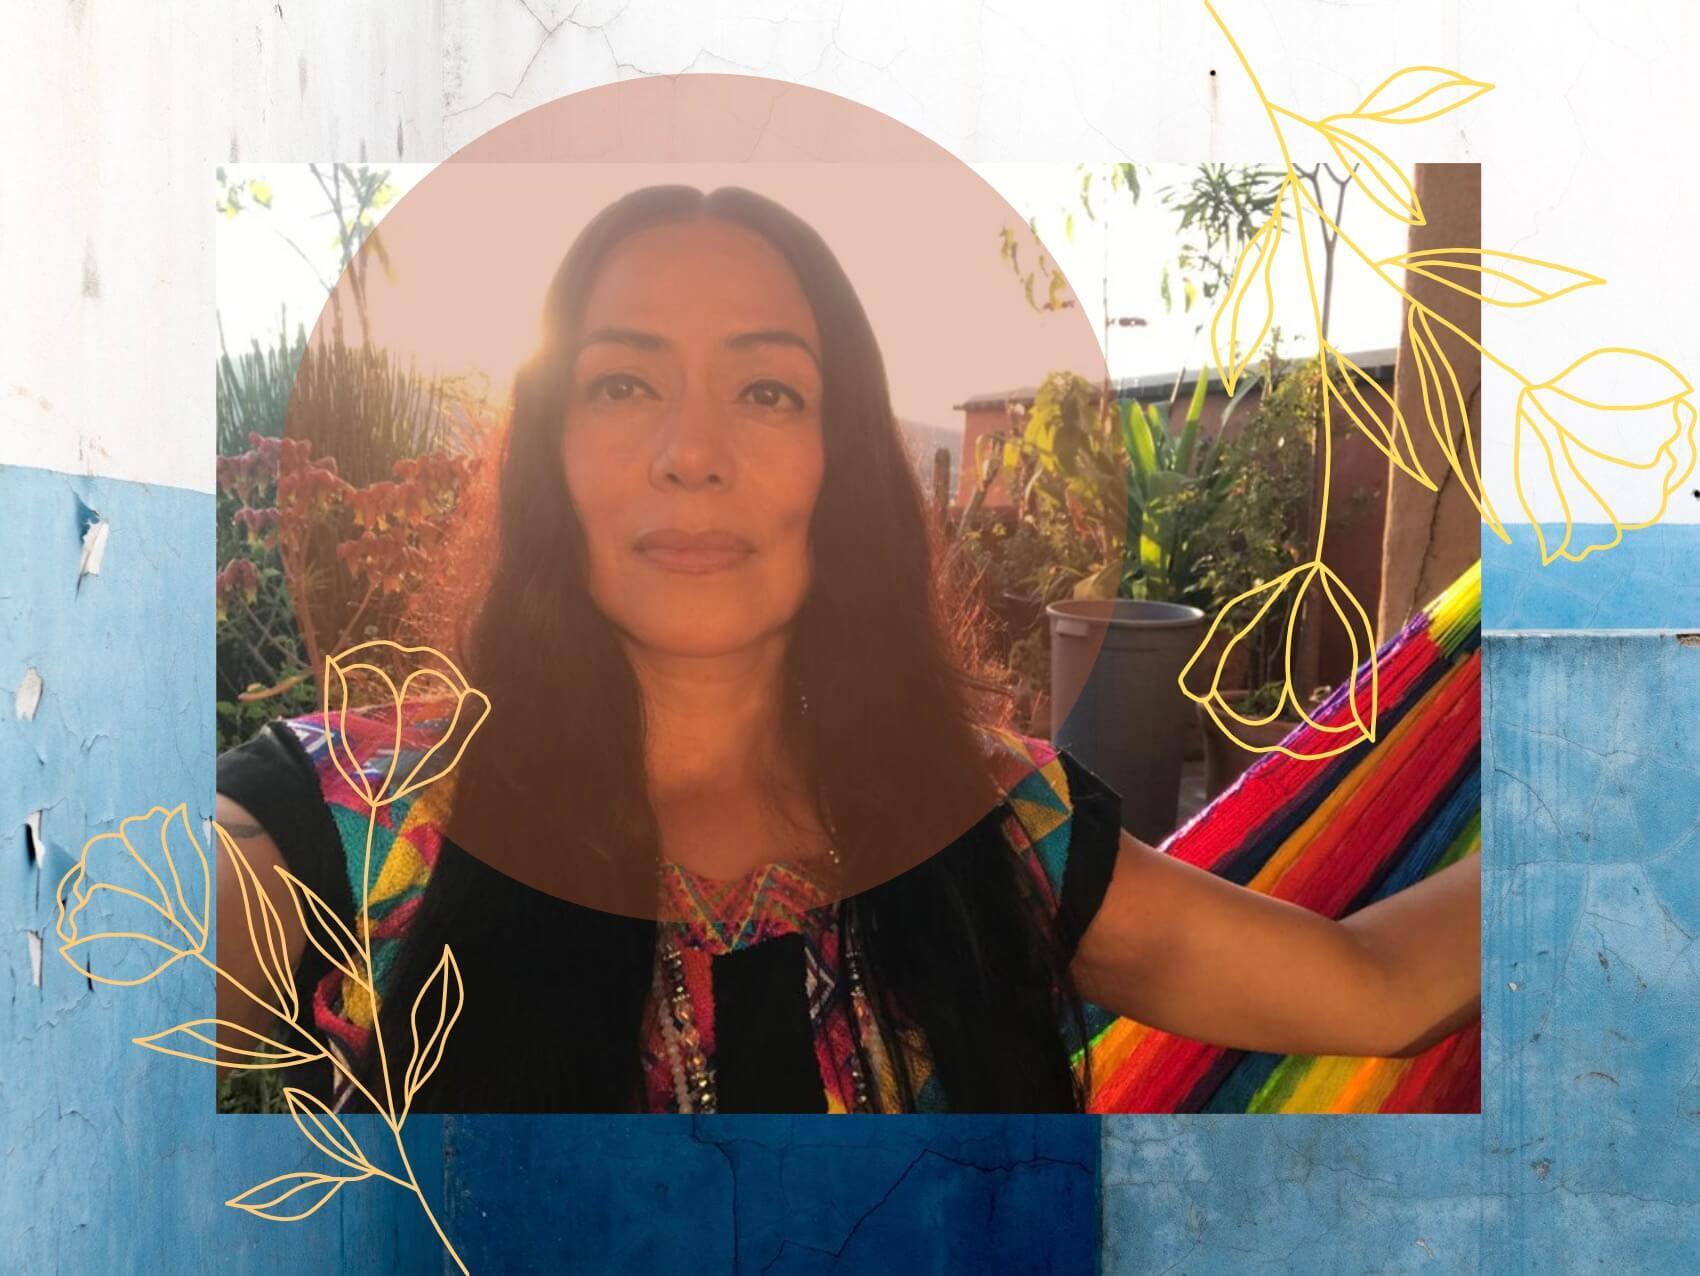 lila-downs-entrevista-reflexion-mexico-comunidad-musico